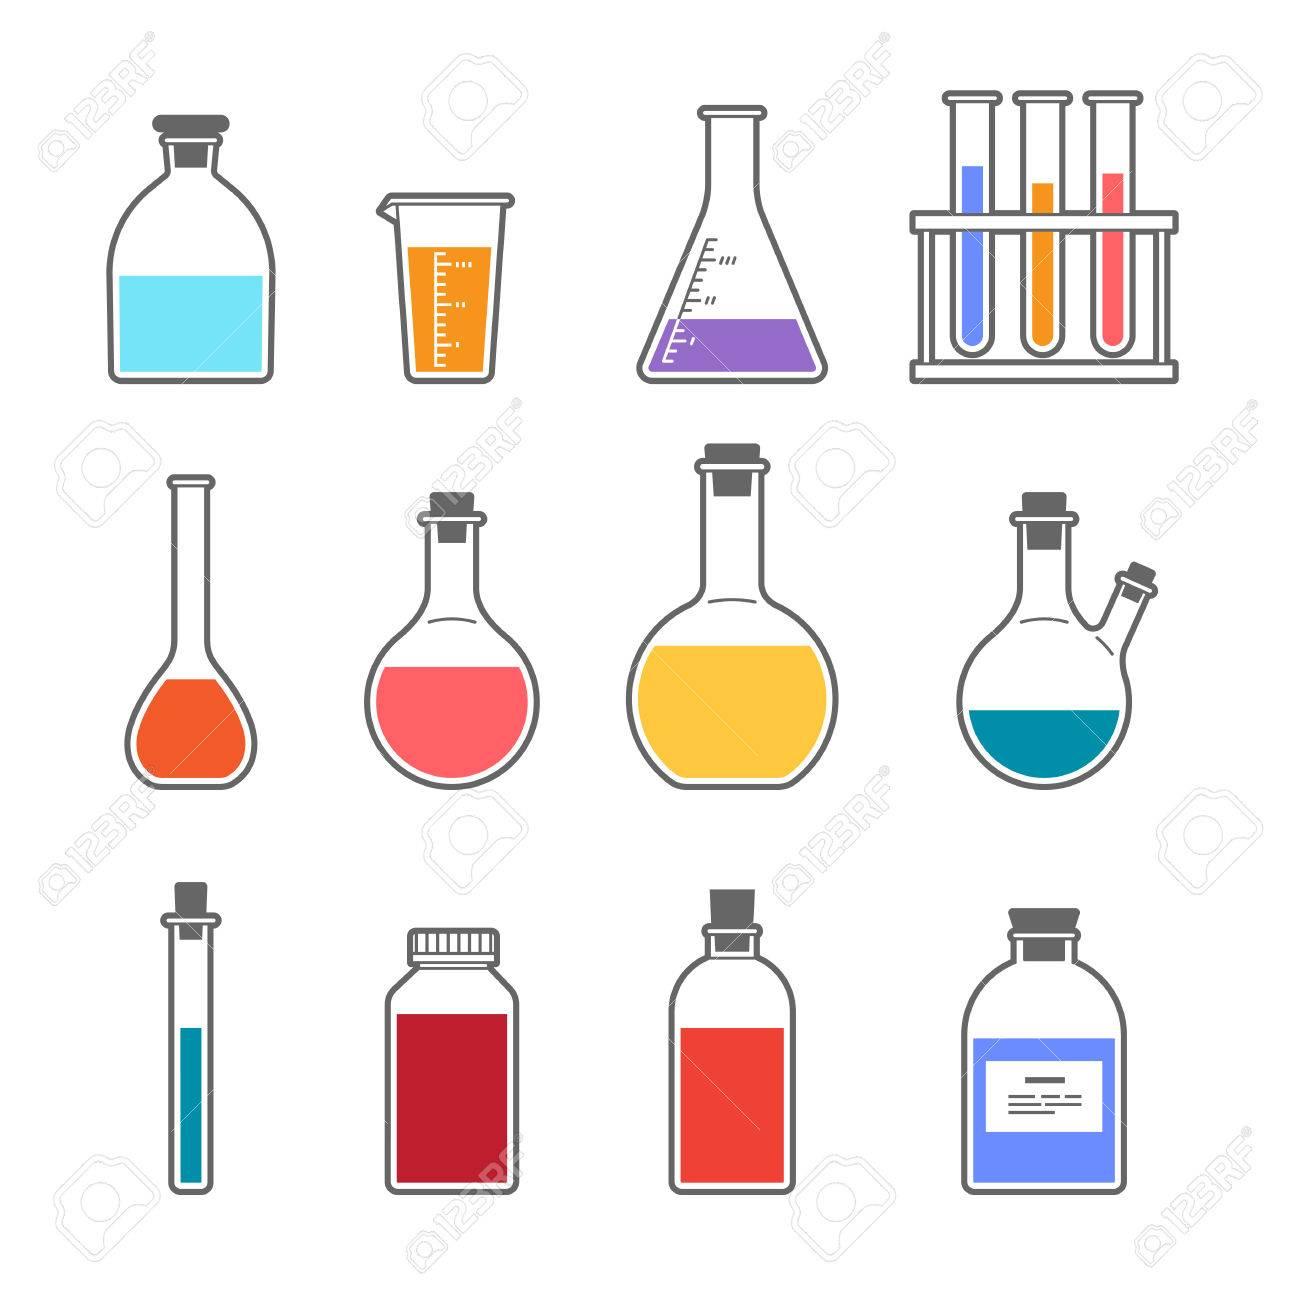 set chemical flask erlenmeyer flask distilling flask, volumetric